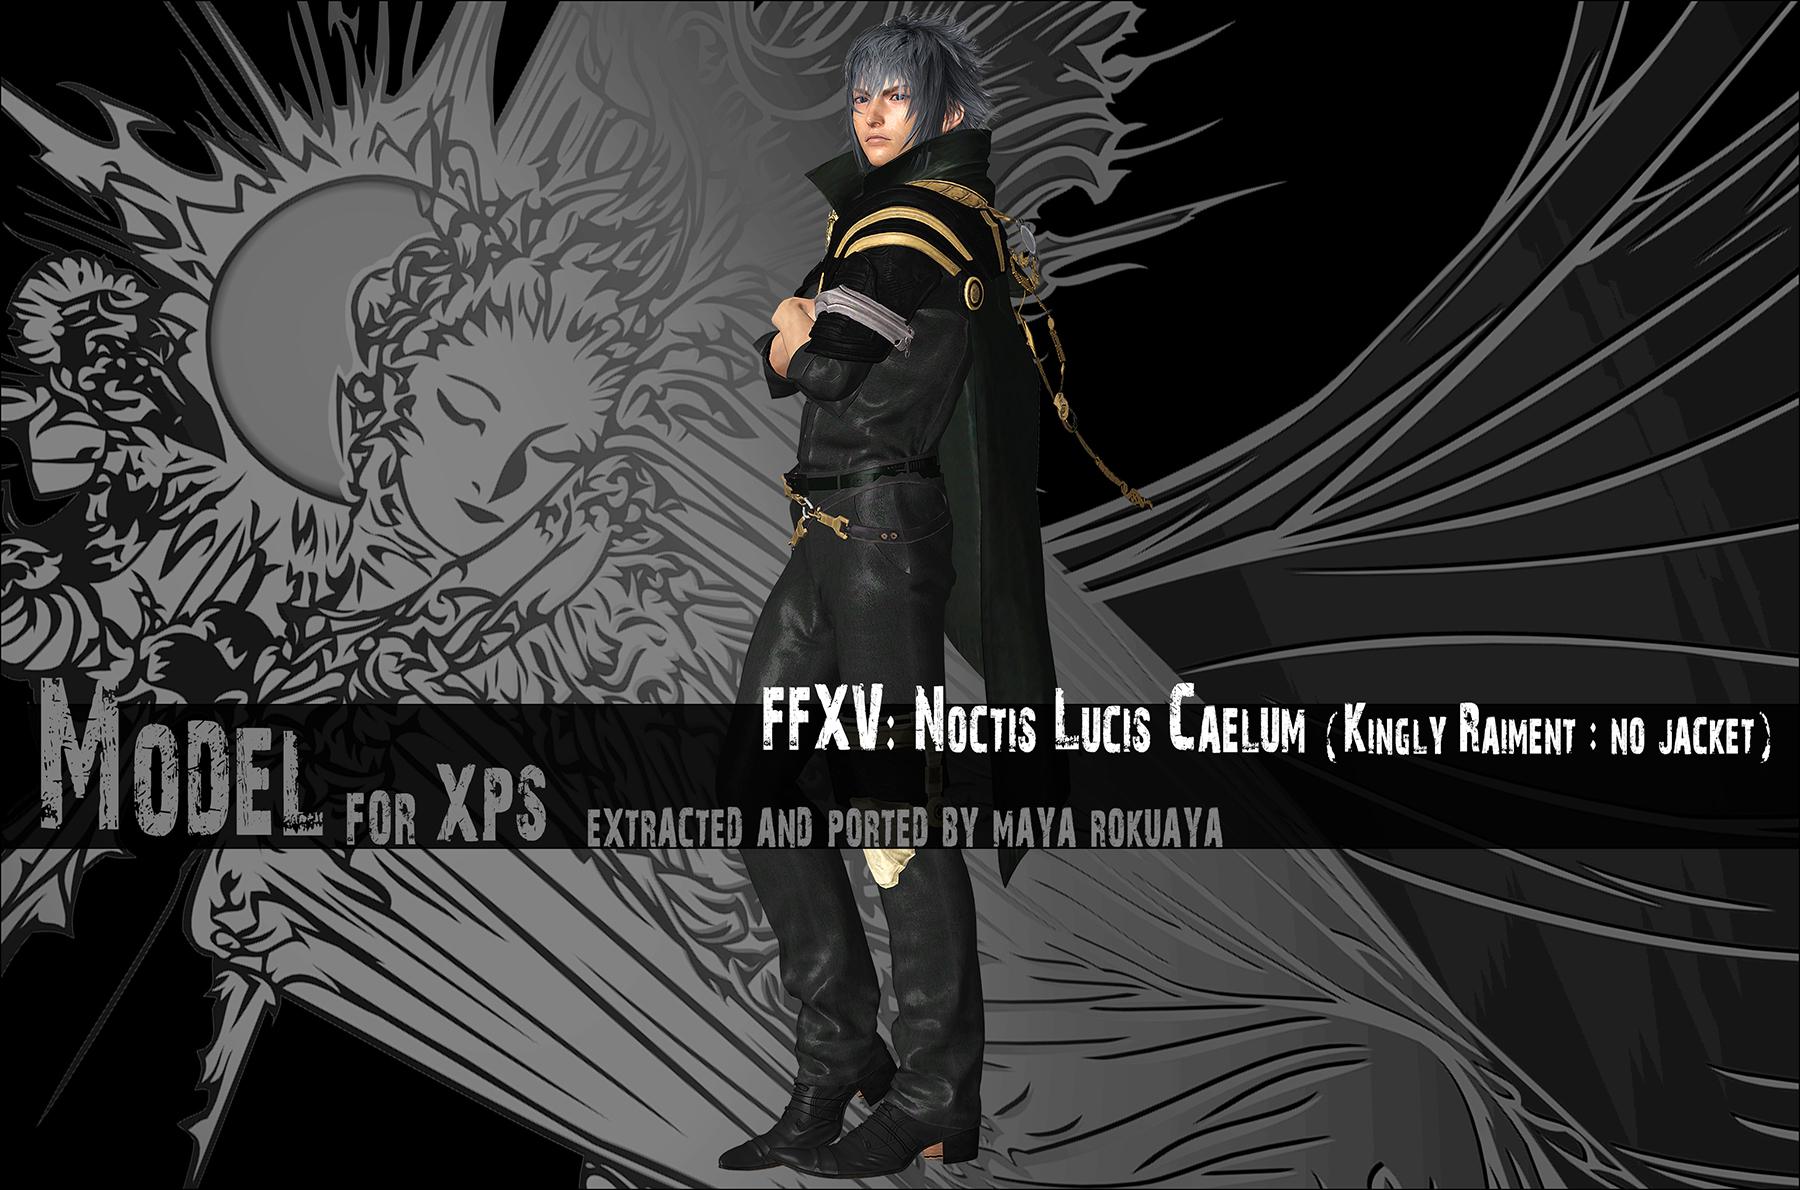 Noctis Lucis Caelum (Kingly Raiment) By